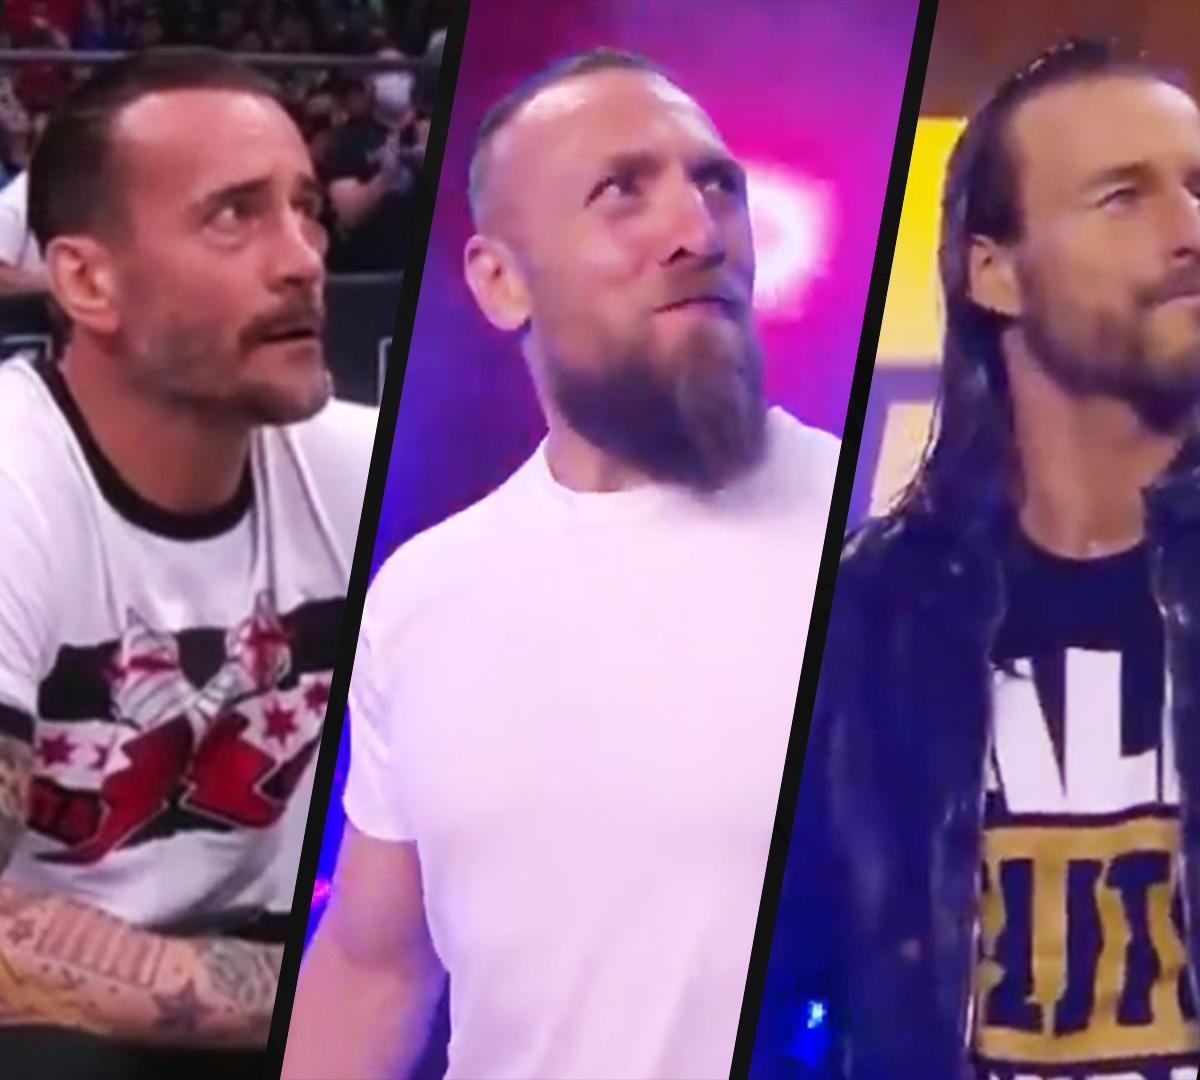 Added AEW Star Power of CM Punk and Bryan Danielson Should Frighten WWE